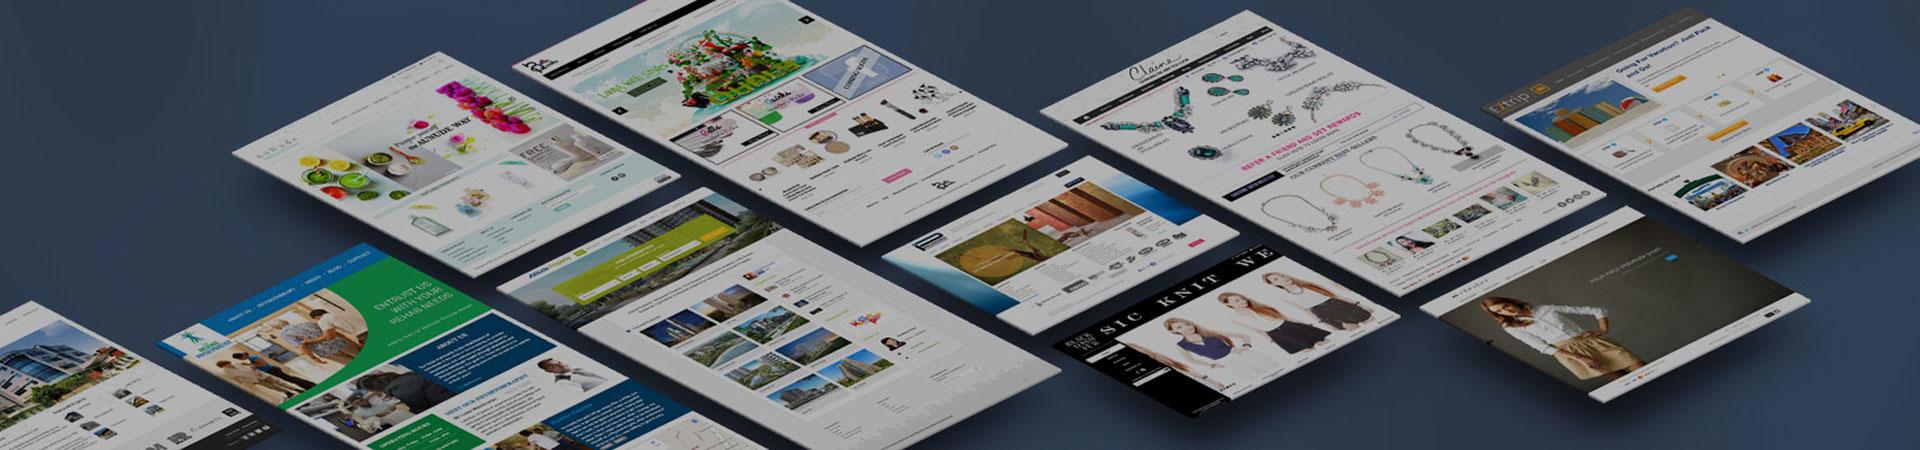 Website Design Singapore - Shorai